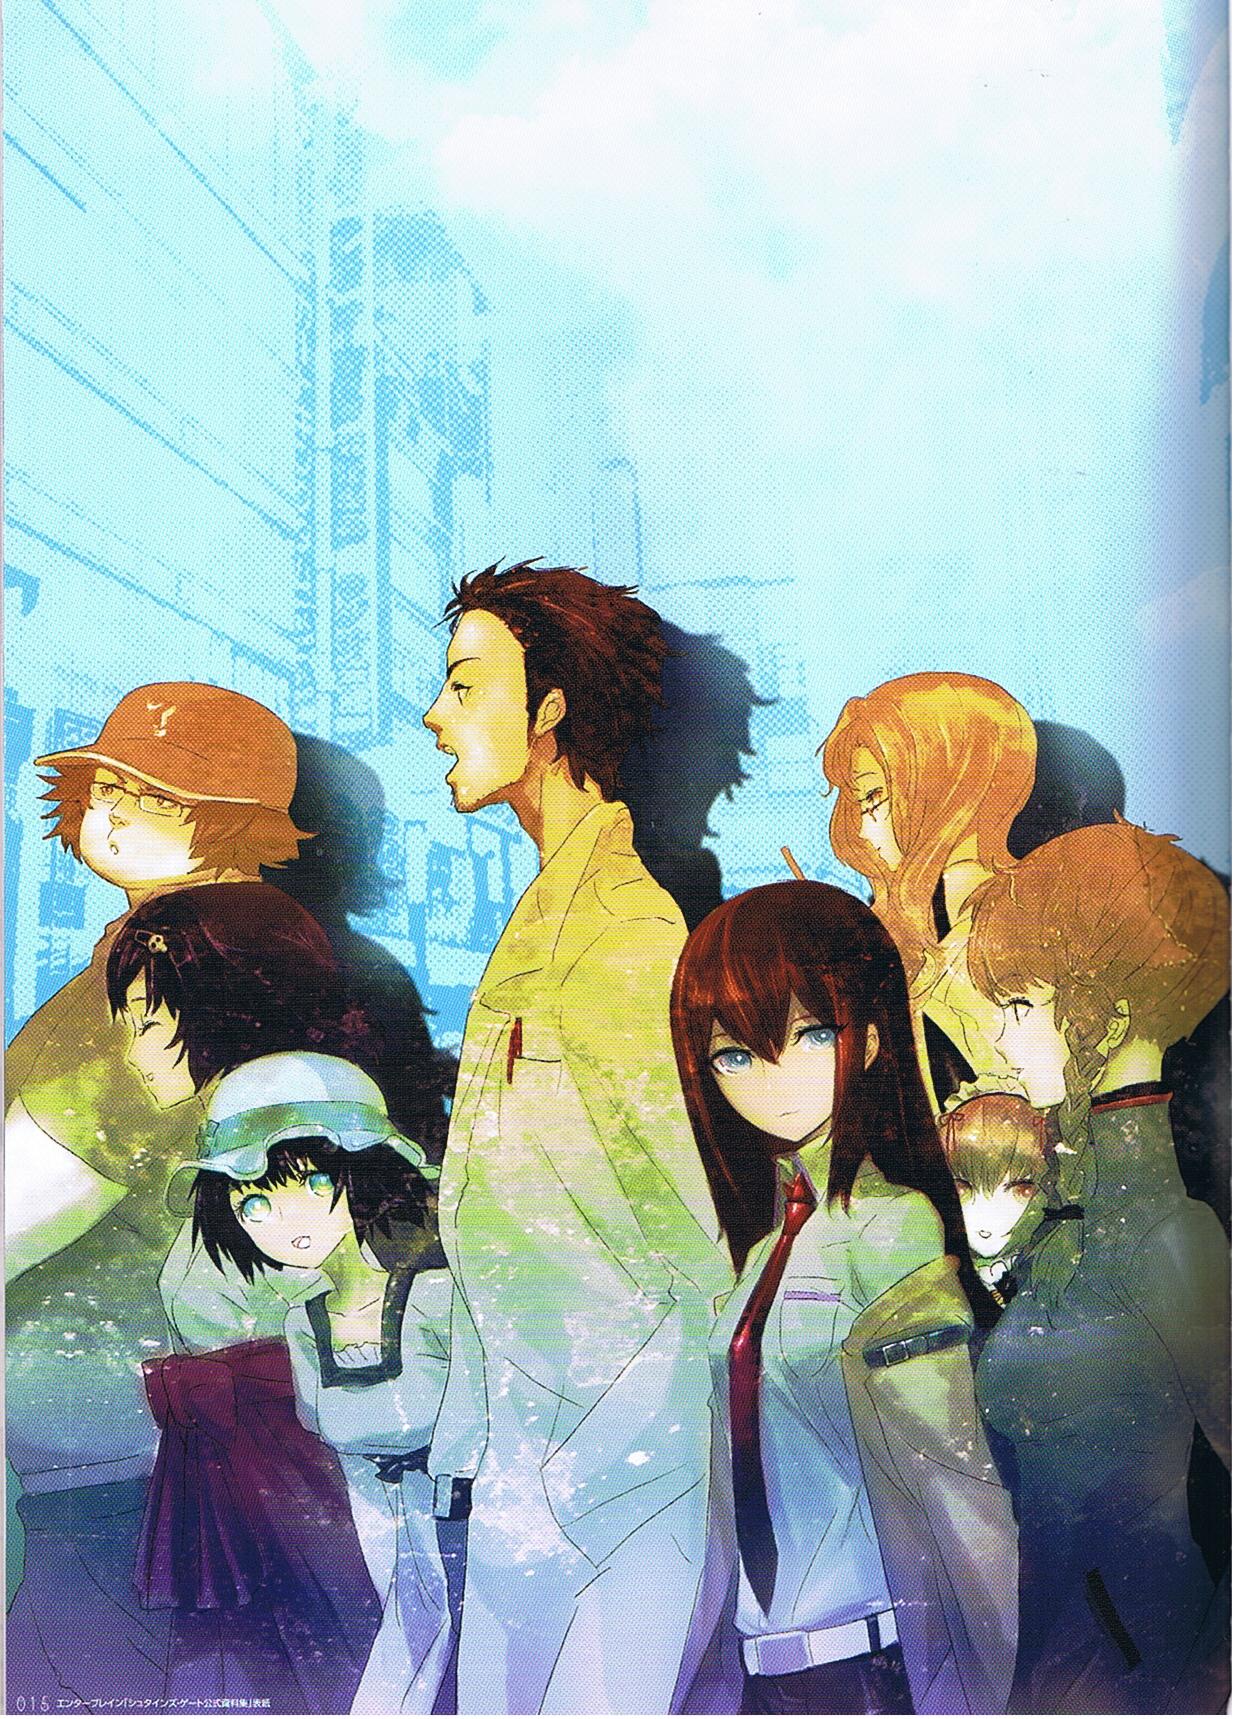 Anime Girl Live Wallpaper Artbook Steins Gate